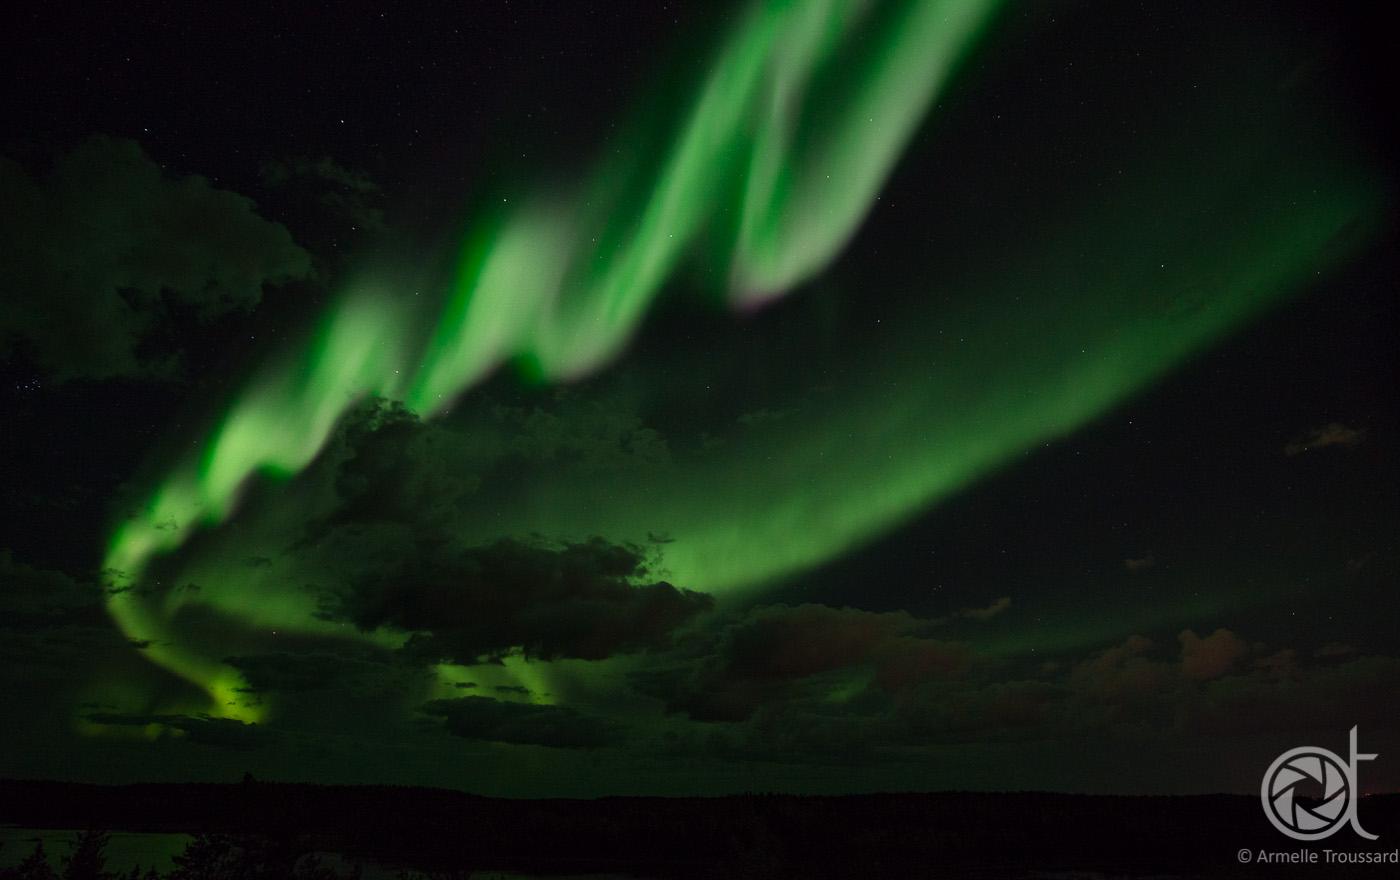 Northern lights - Vee lake, Northwest Territories, Canada.